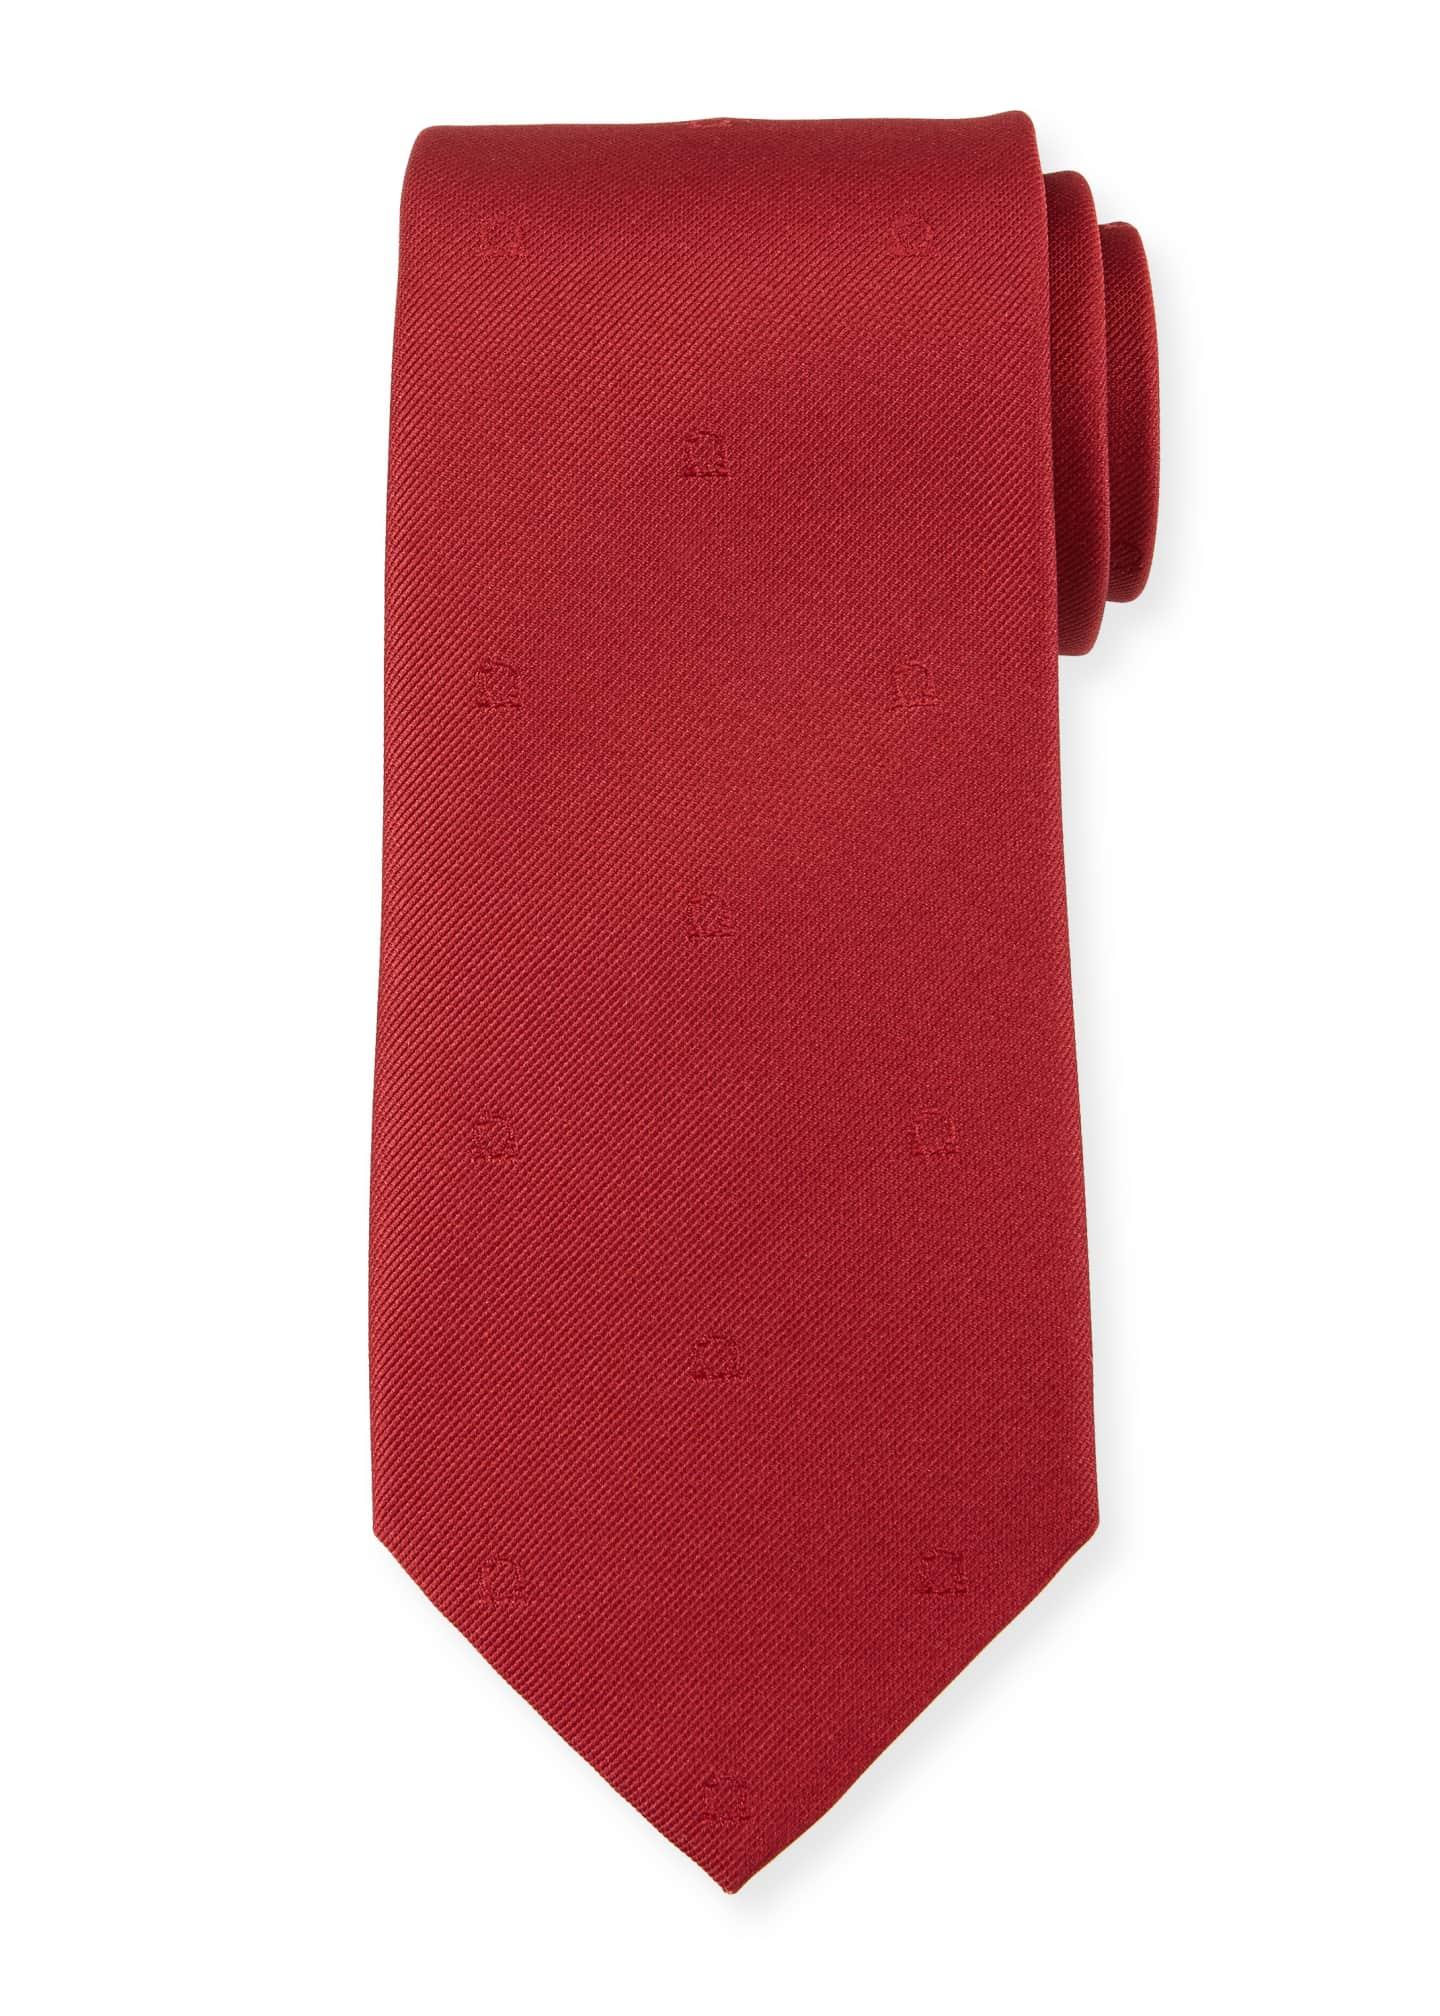 Salvatore Ferragamo Eston Solid Silk Tie, Red